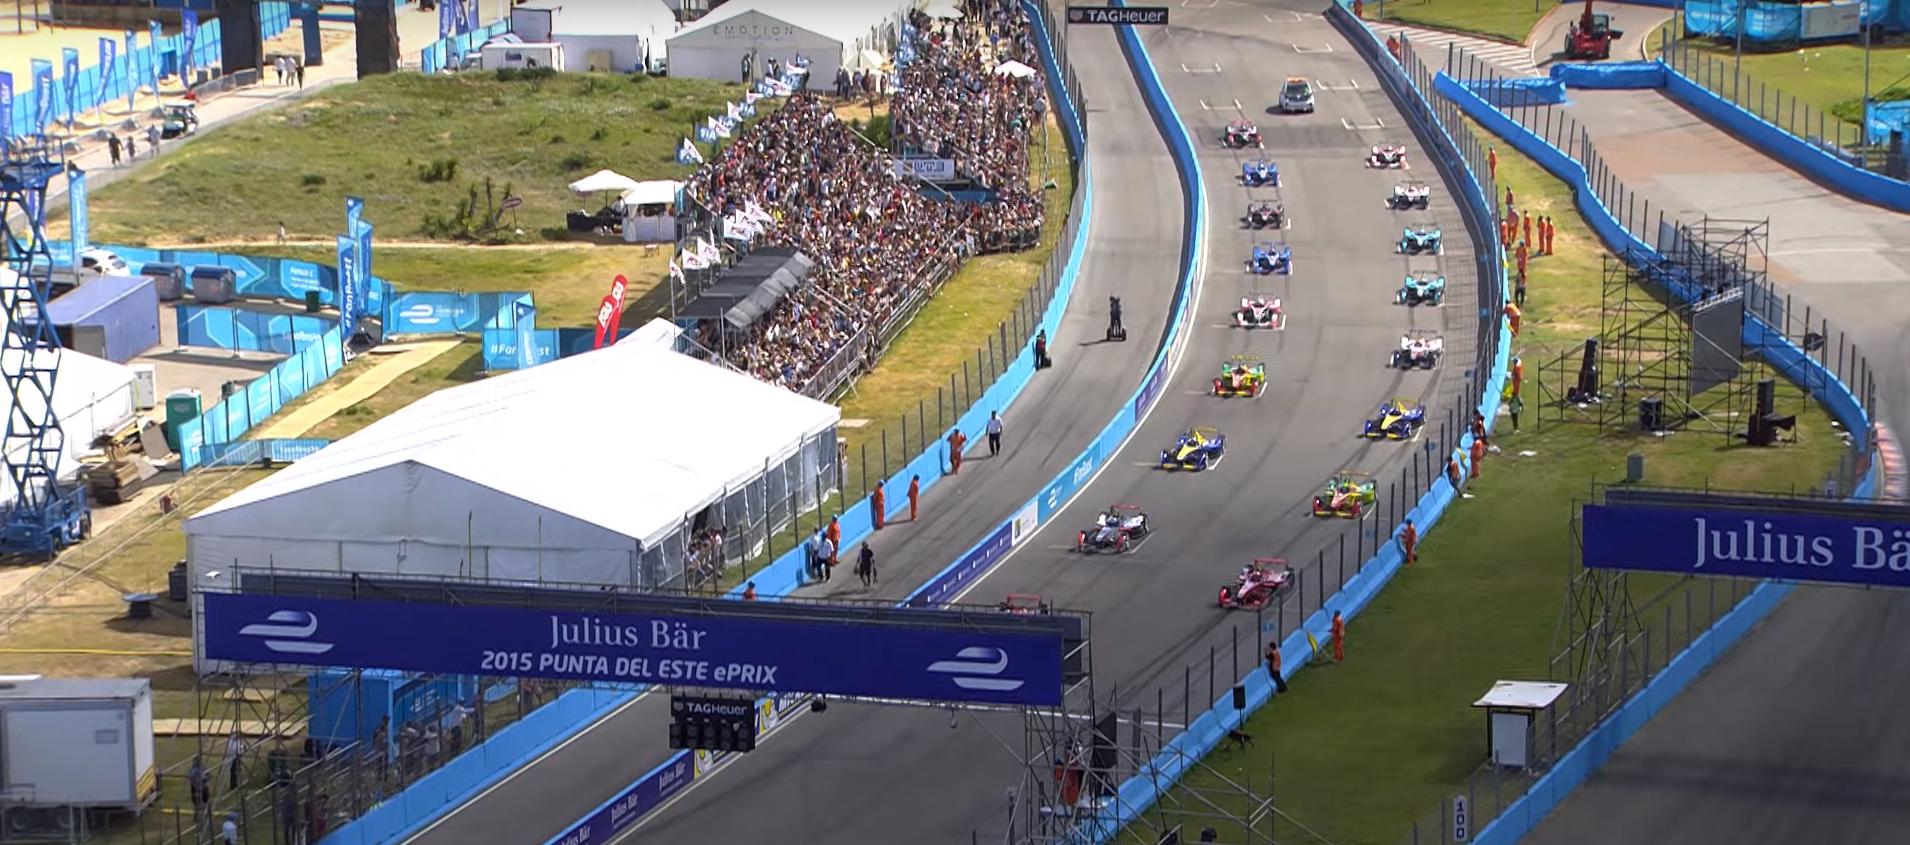 Formula E punta del este 2015